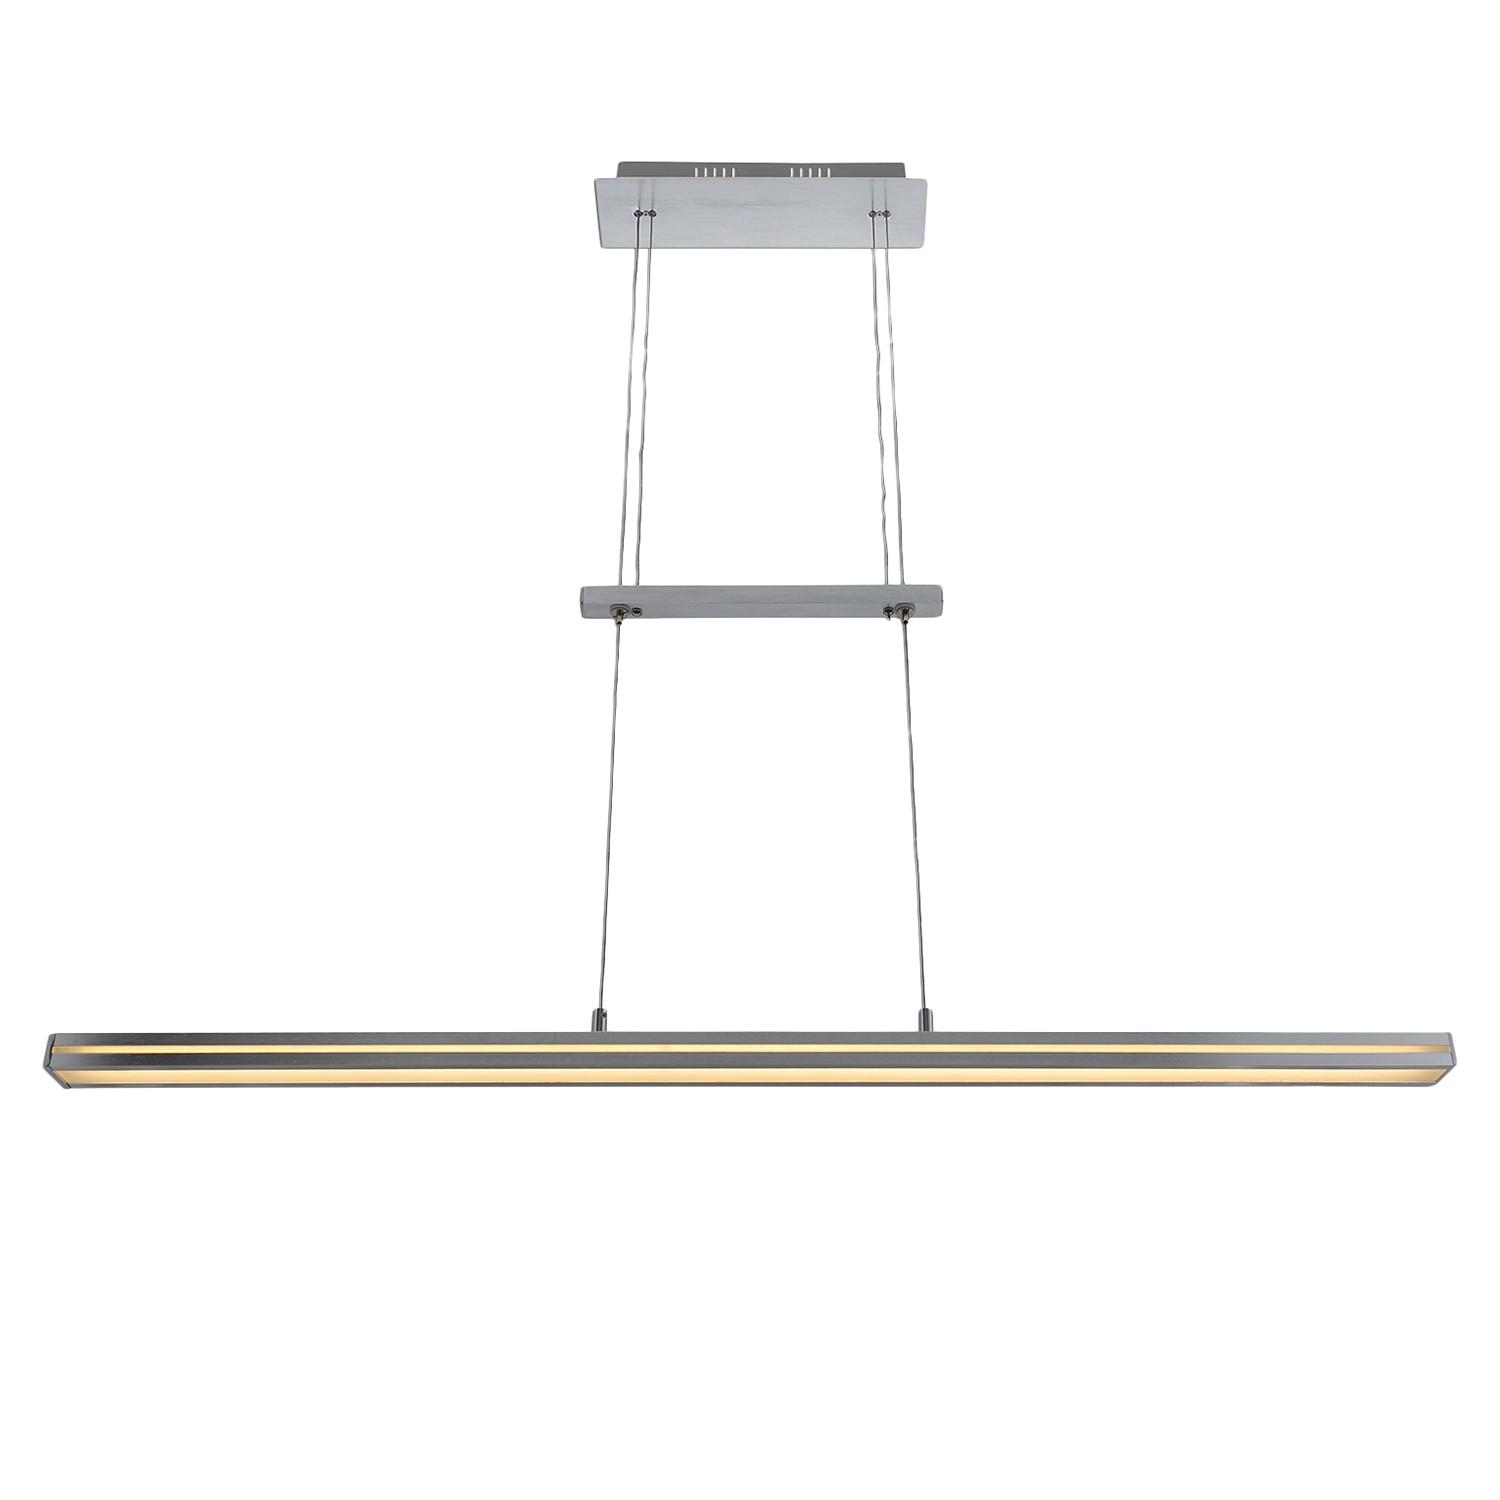 LED-Pendelleuchte Acrylico | Lampen > Deckenleuchten > Pendelleuchten | Silber | Kunststoff - Metall | Naeve